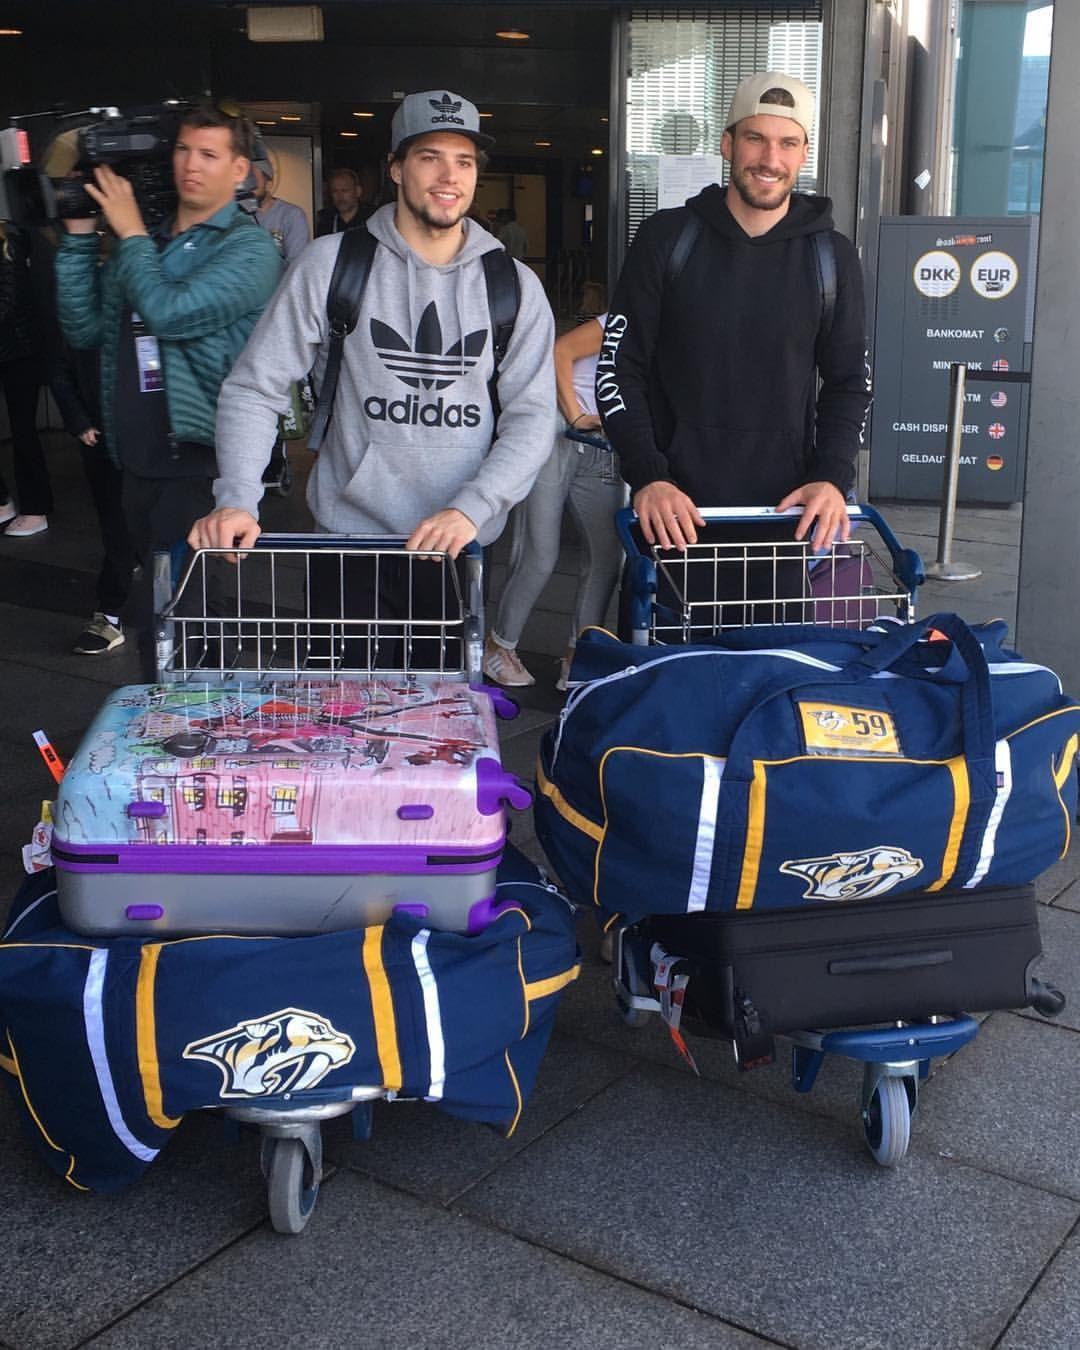 Kevin Fiala and Roman Josi, Nashville Predators...why does